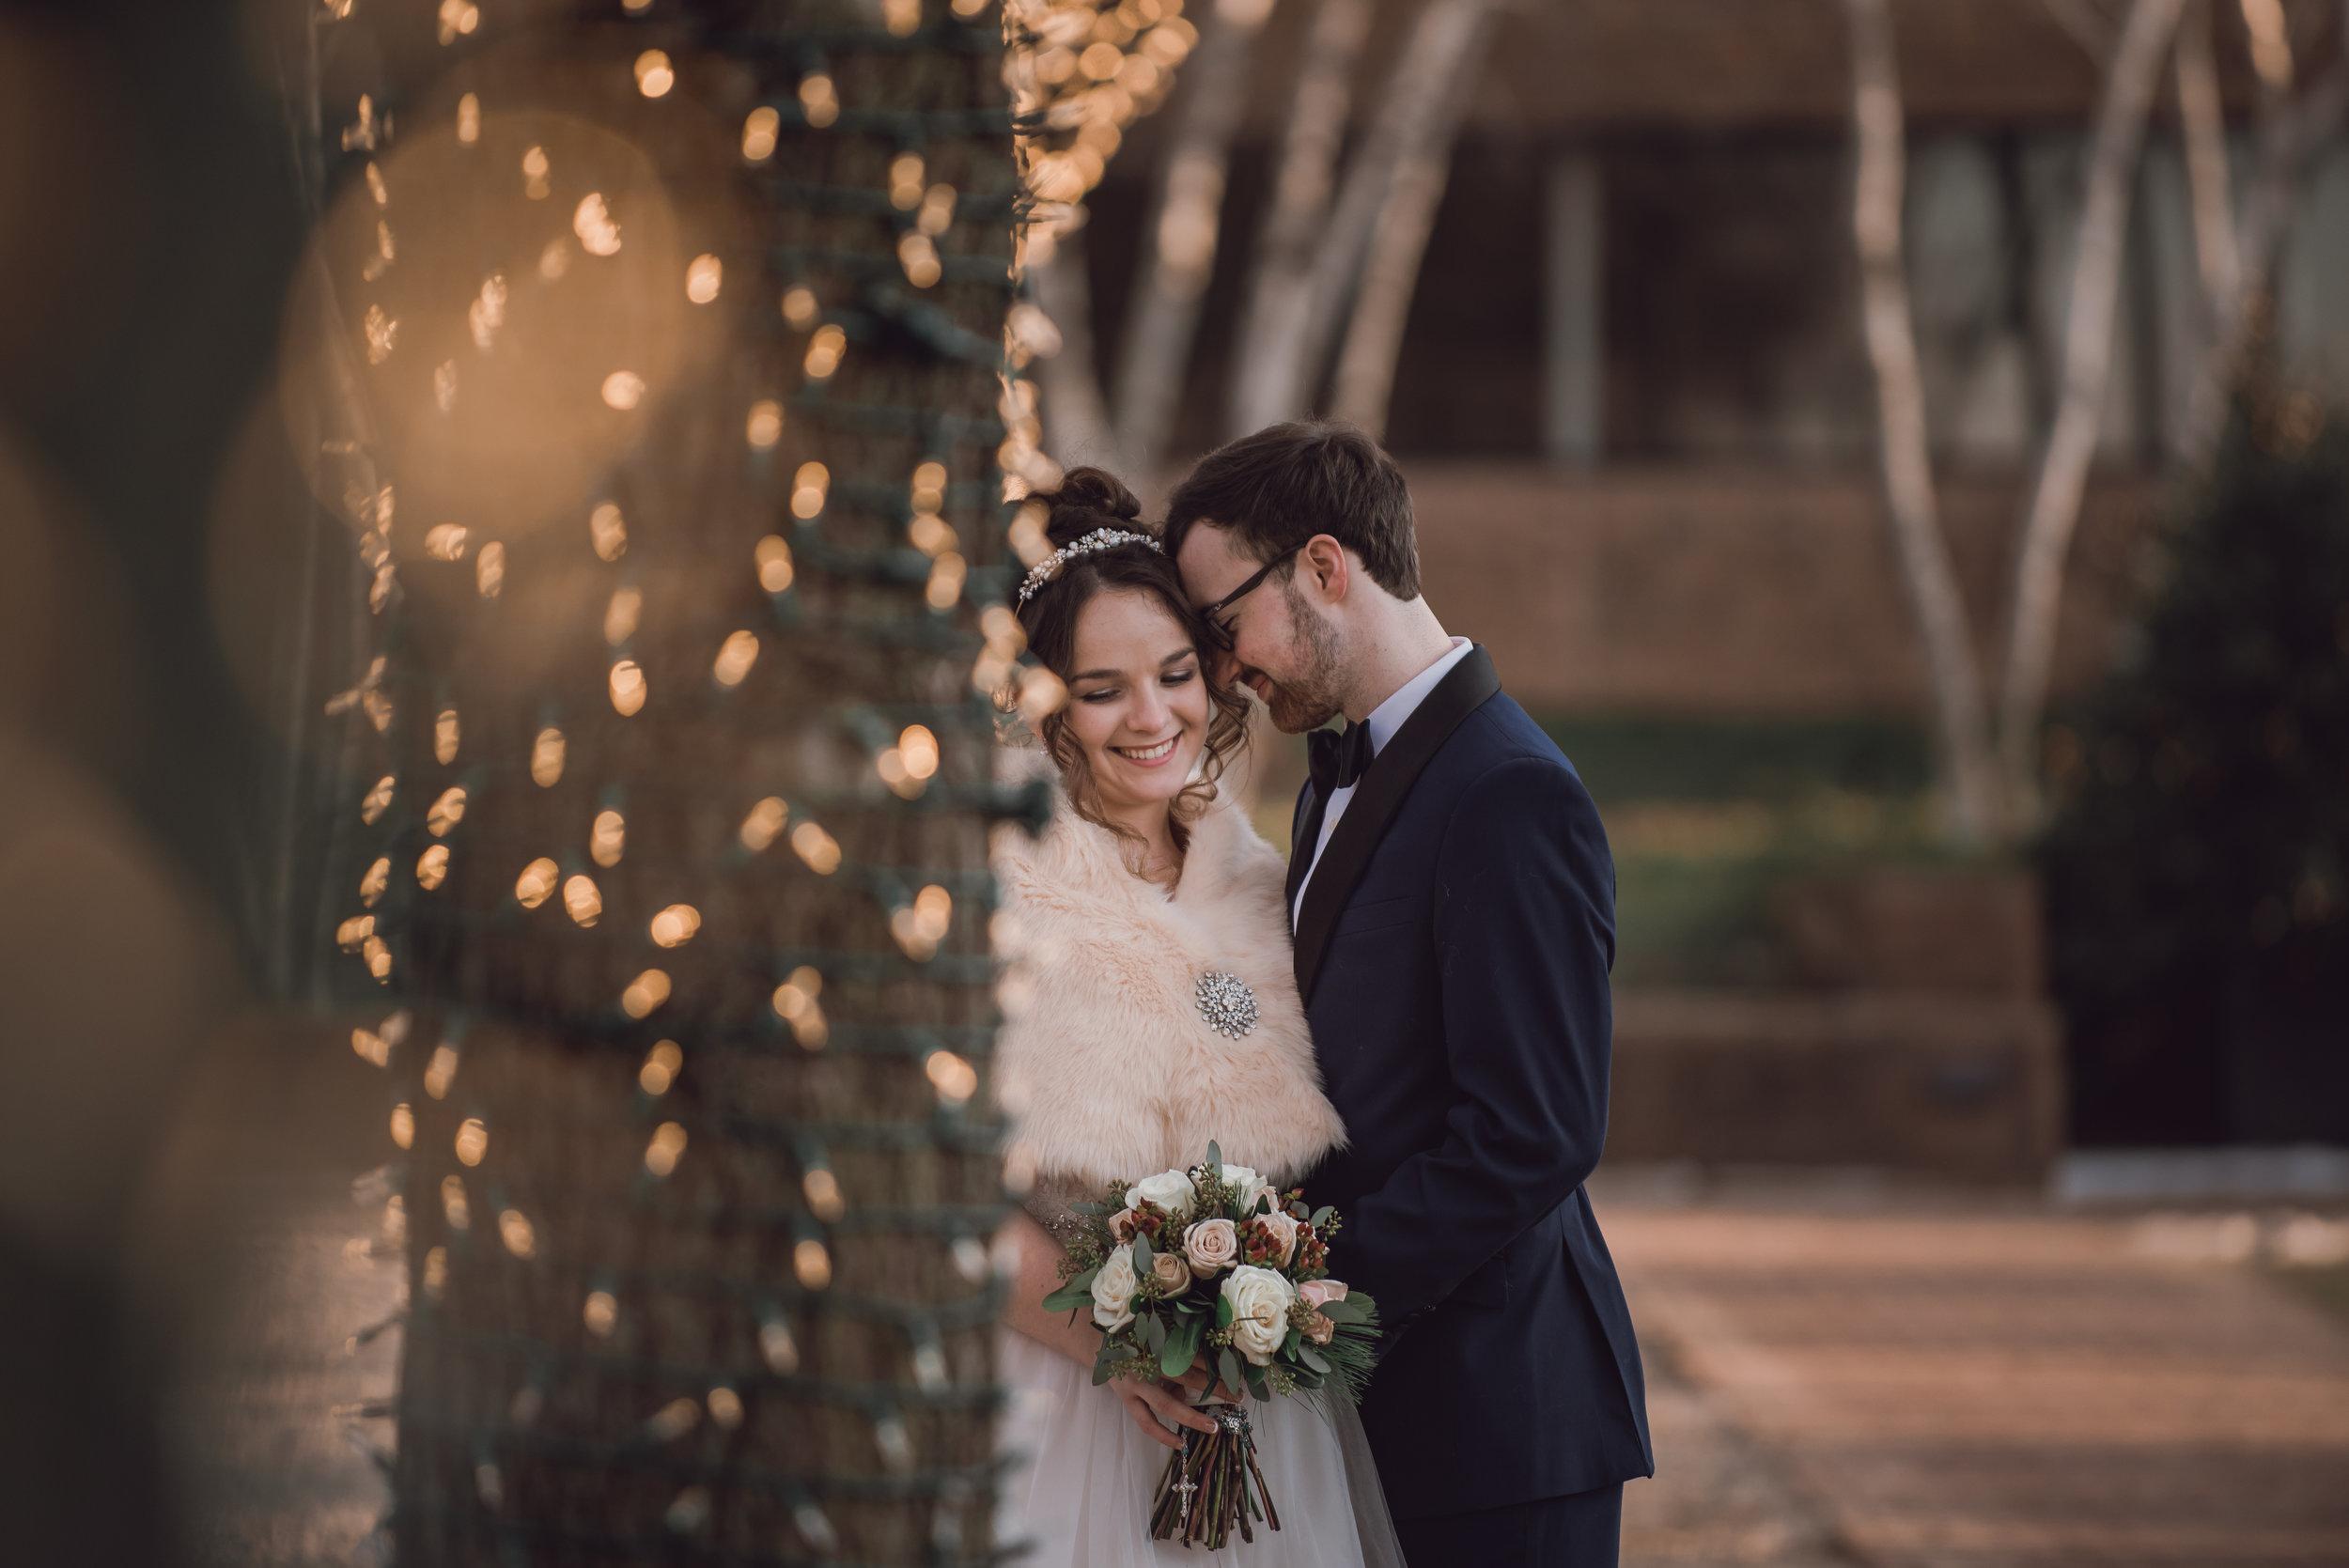 Chicago wedding photography, Chicago Botanic Garden, Meridian Photography